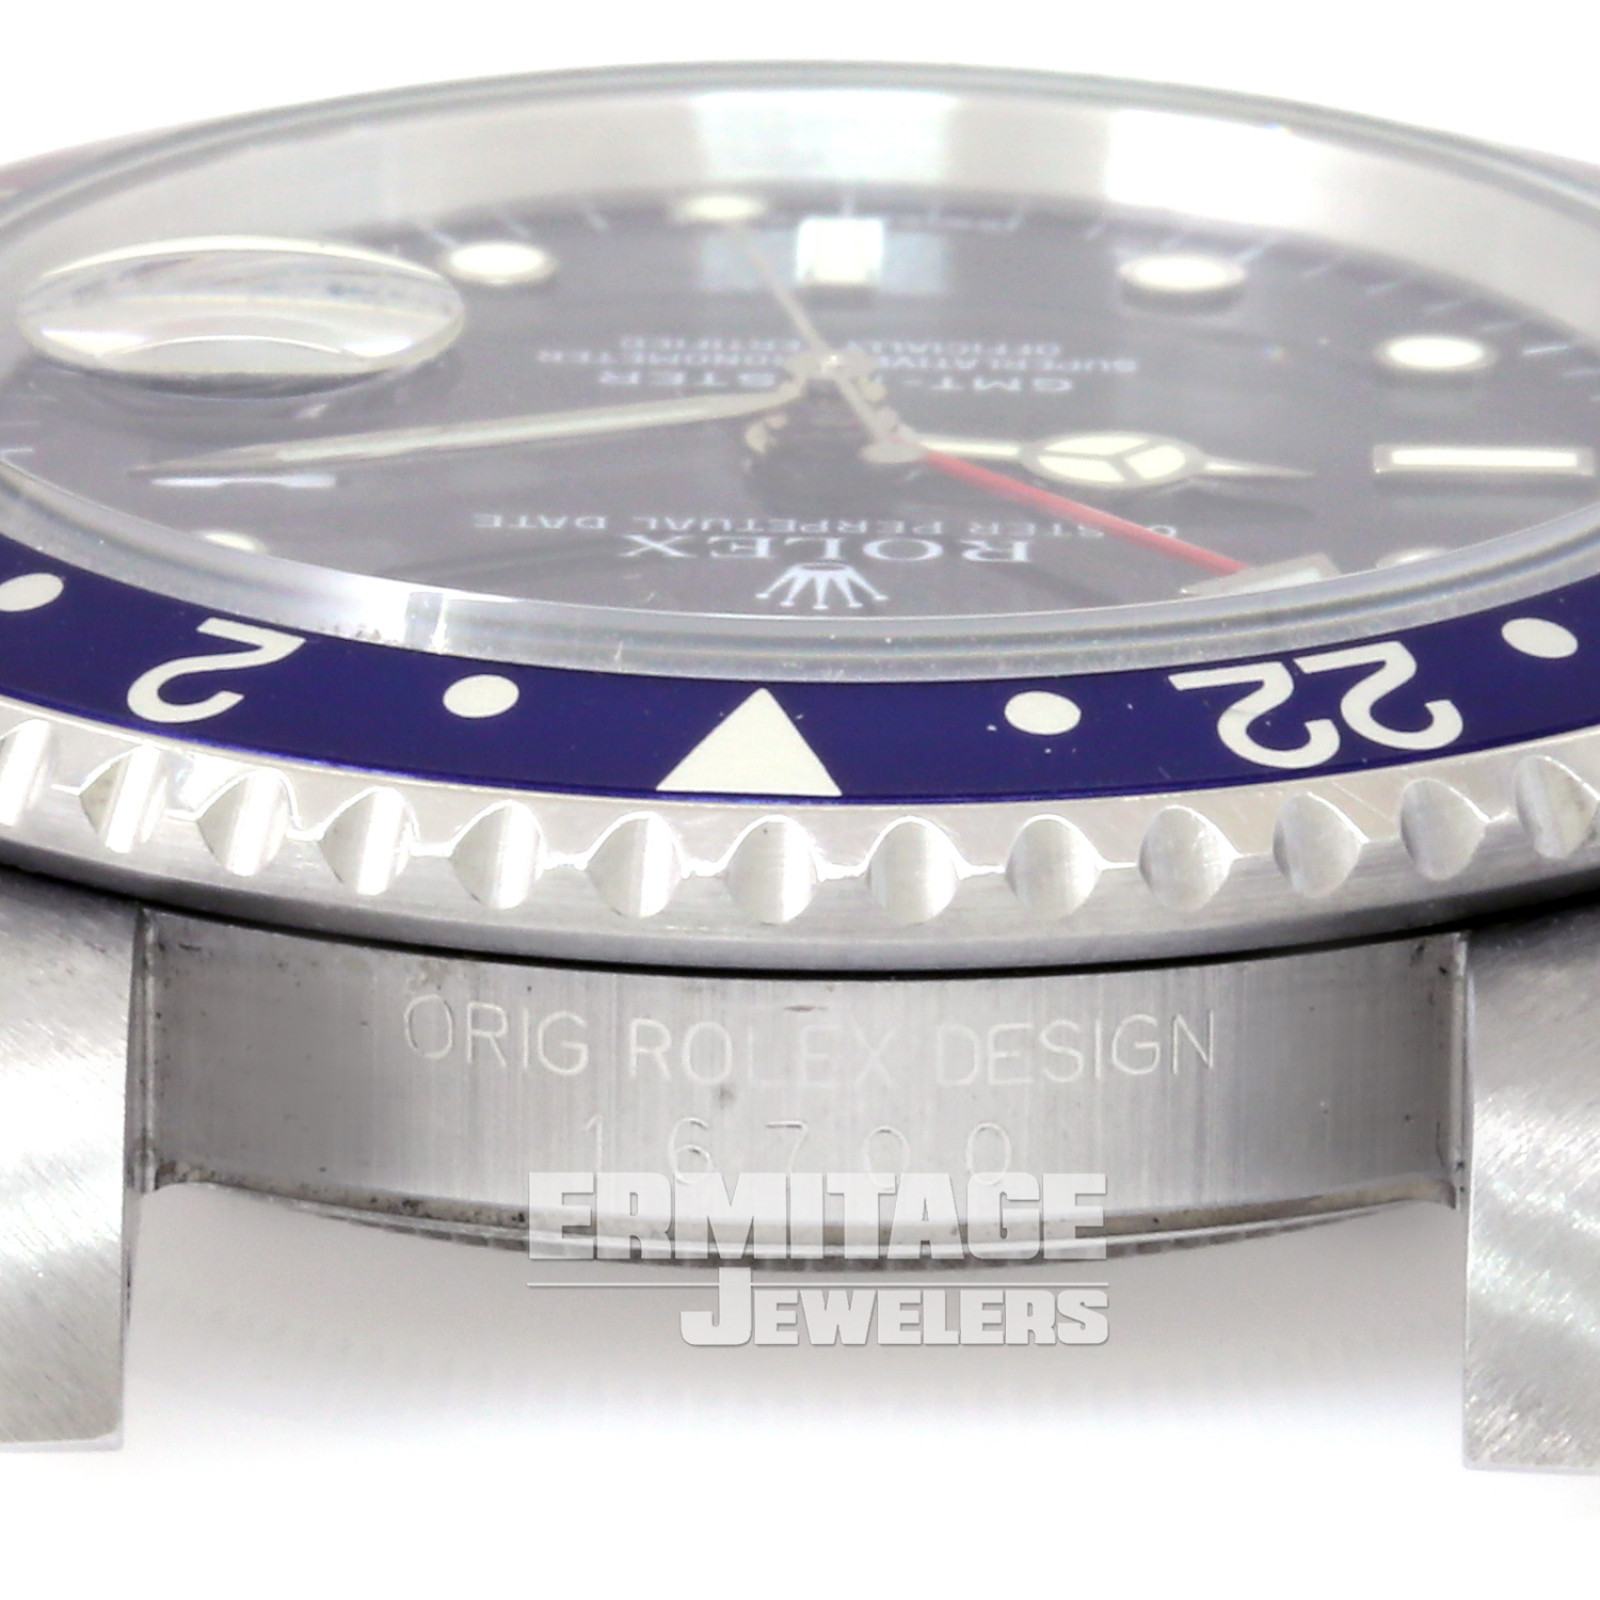 Rolex GMT-Master 16700 Transitional Model 1989